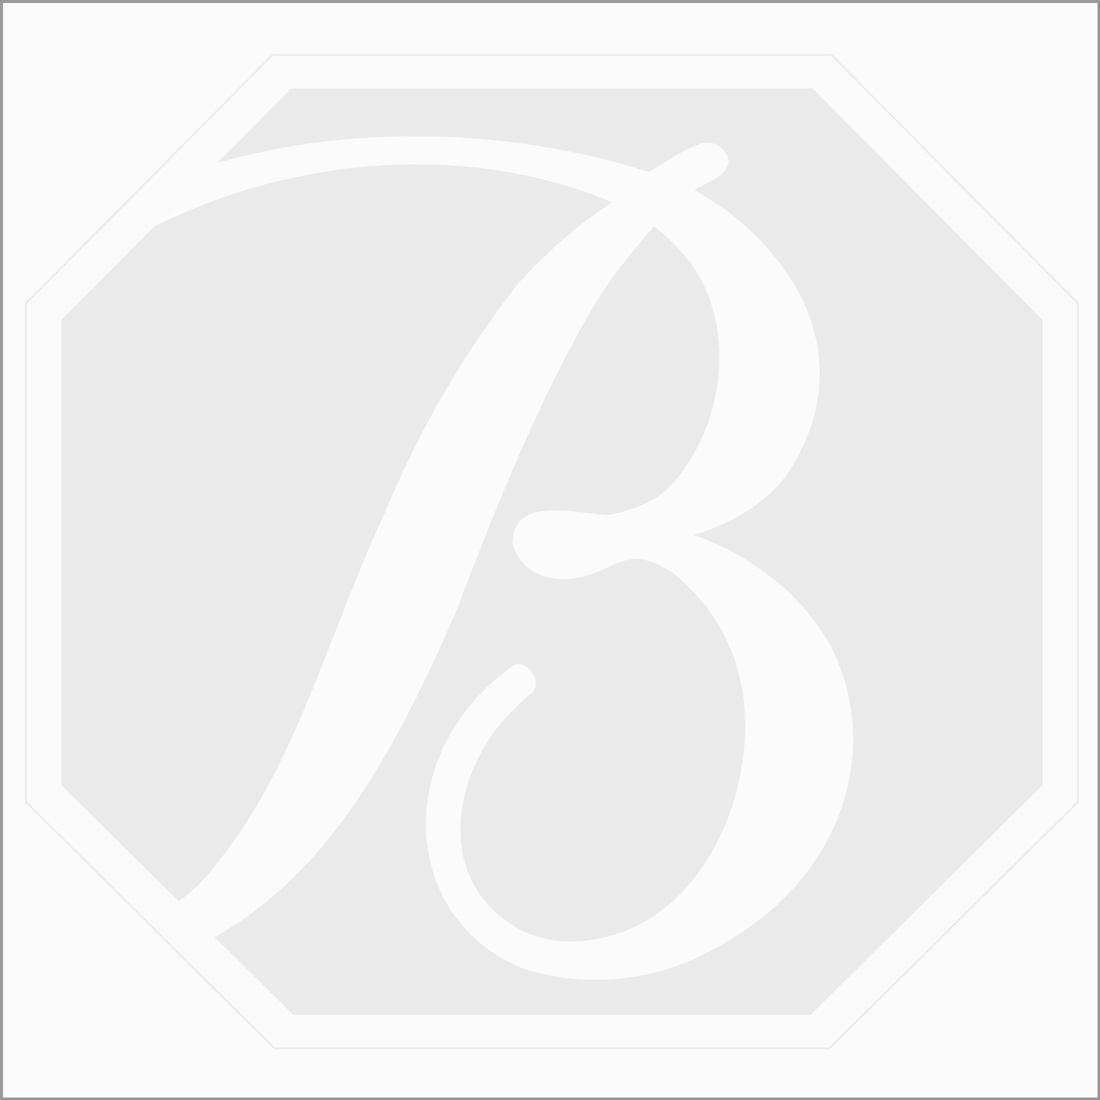 8 Pieces - Medium Tones Multi-Sapphire Rose Cut - 17 x 12 mm to 19 x 15 mm - 150.33 carats (MSRC1274)